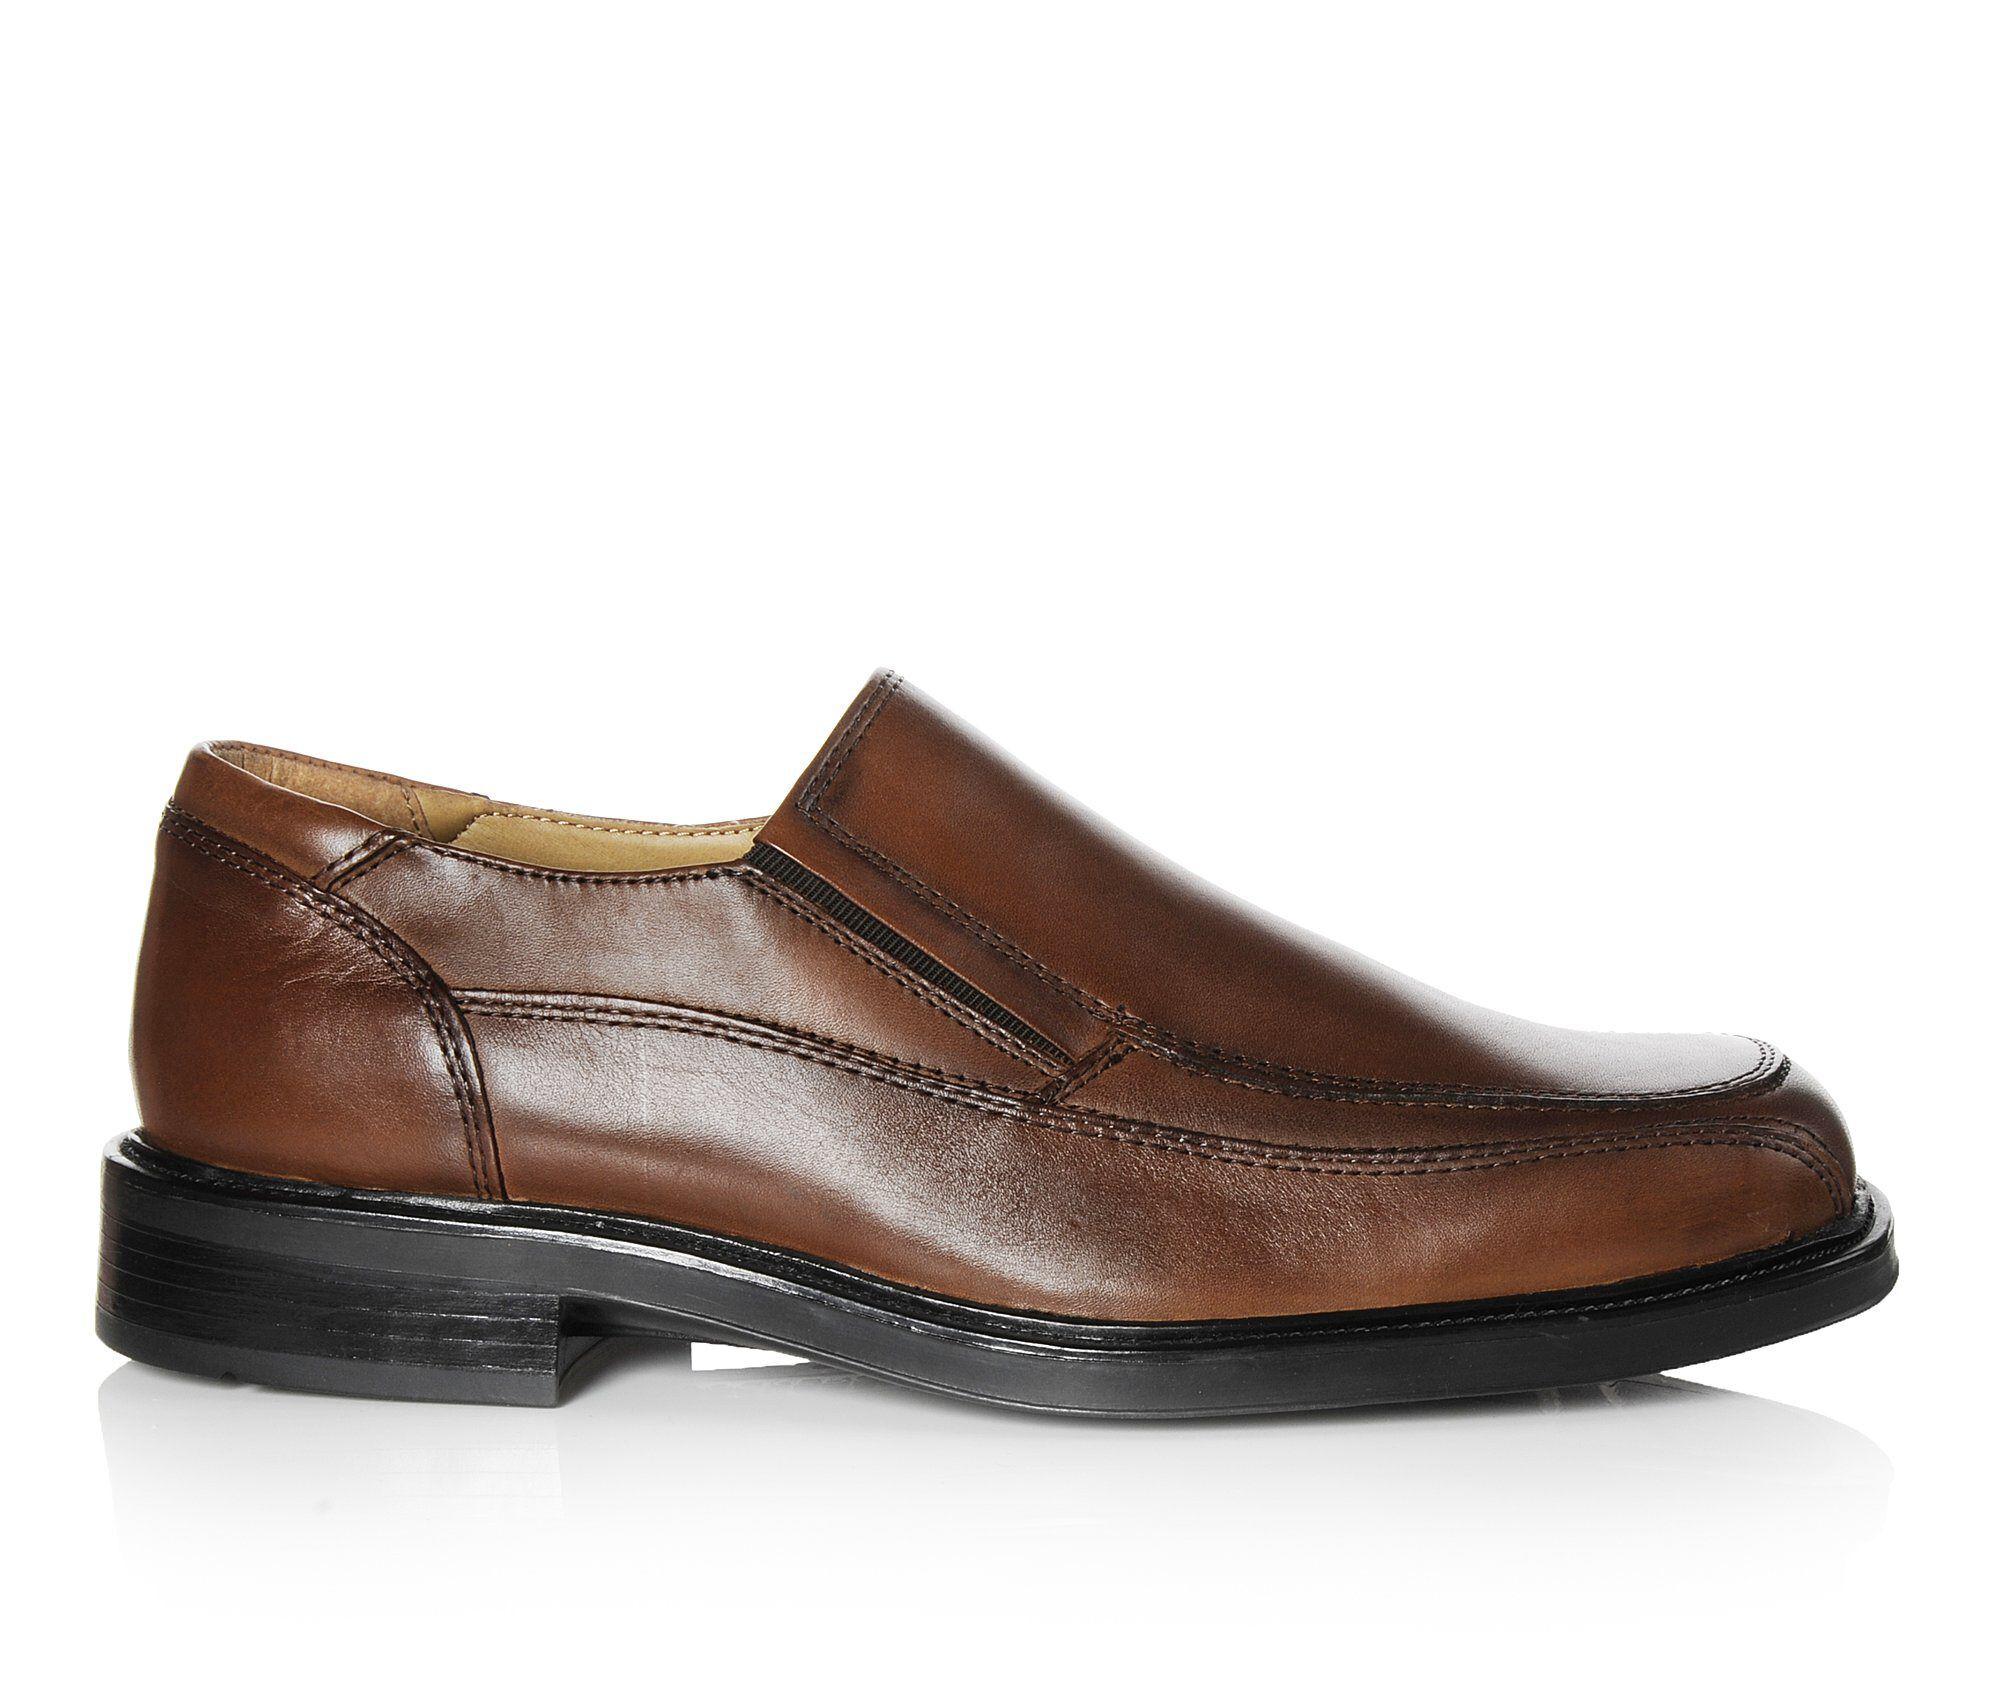 Designer For Sale Men's Dockers Proposal Dress Shoes Tan